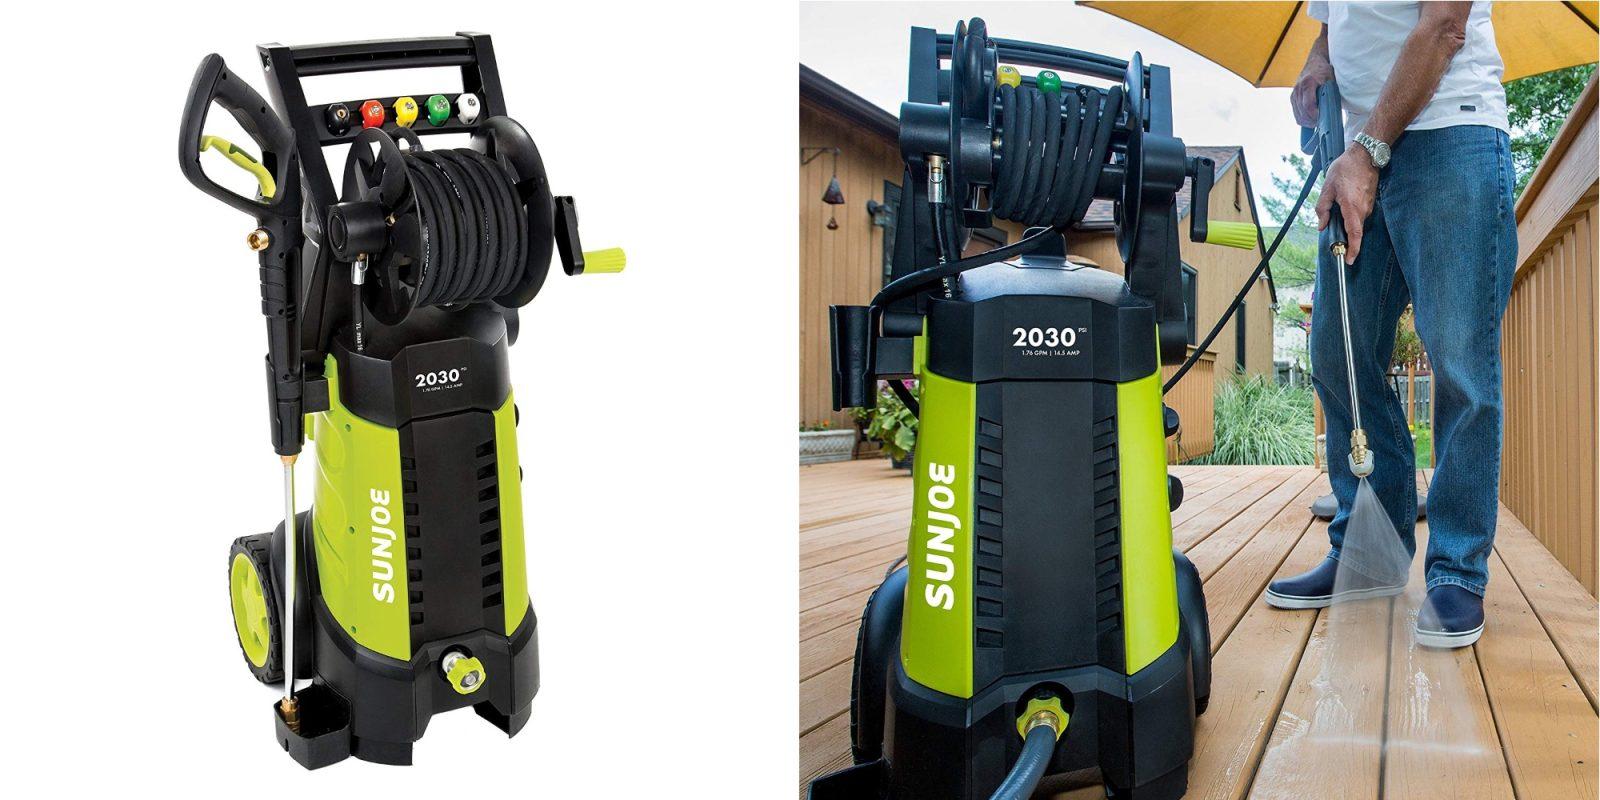 Sun Joe's 14 5A Electric Pressure Washer hits new Amazon low